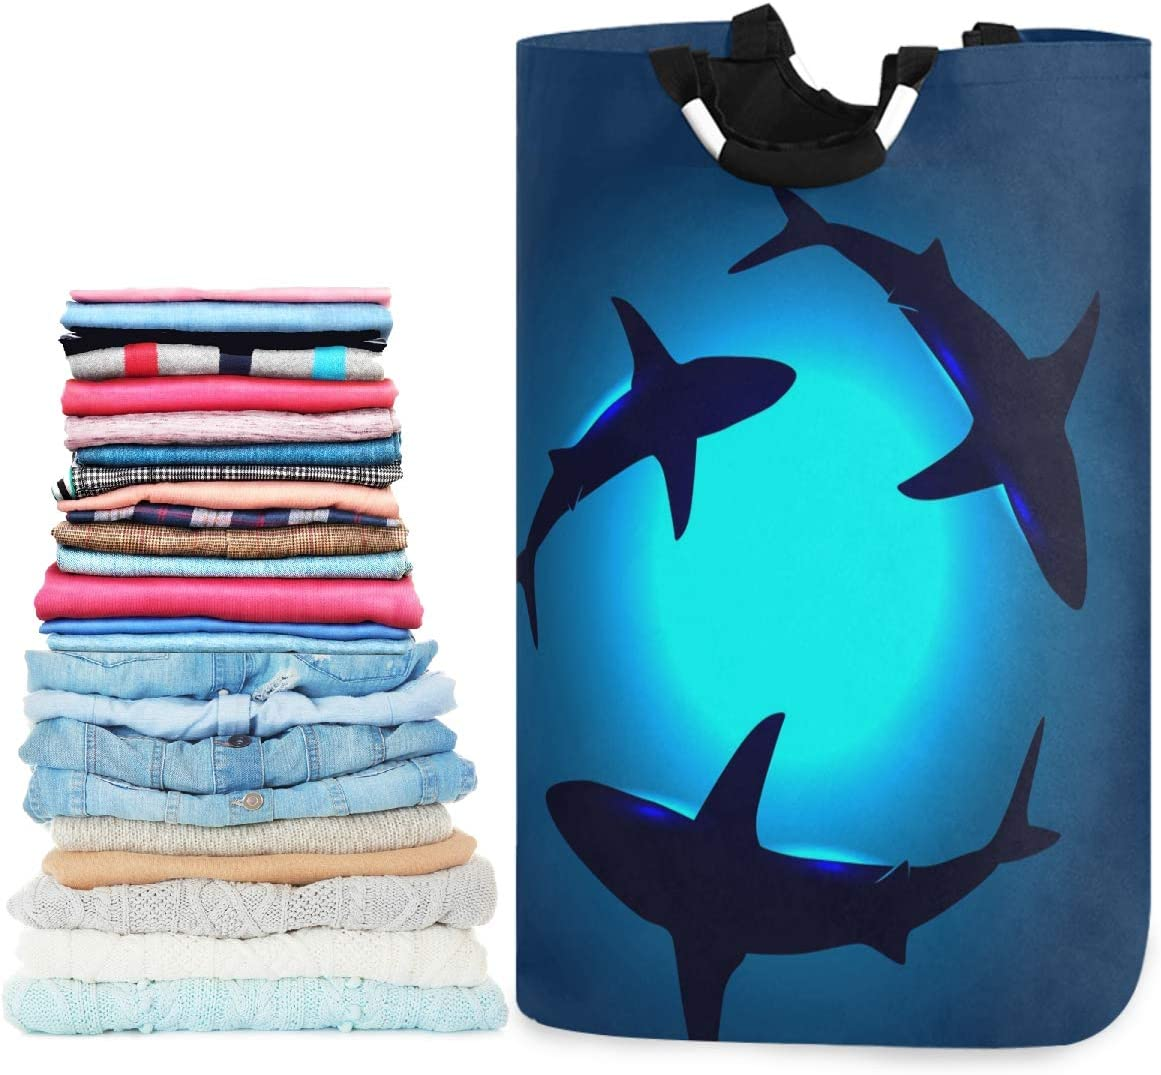 visesunny Floating Shark Large Laundry Hamper with Handle Foldable Durable Clothes Hamper Laundry Bag Toy Bin for Bathroom, Bedroom, Dorm, Travel